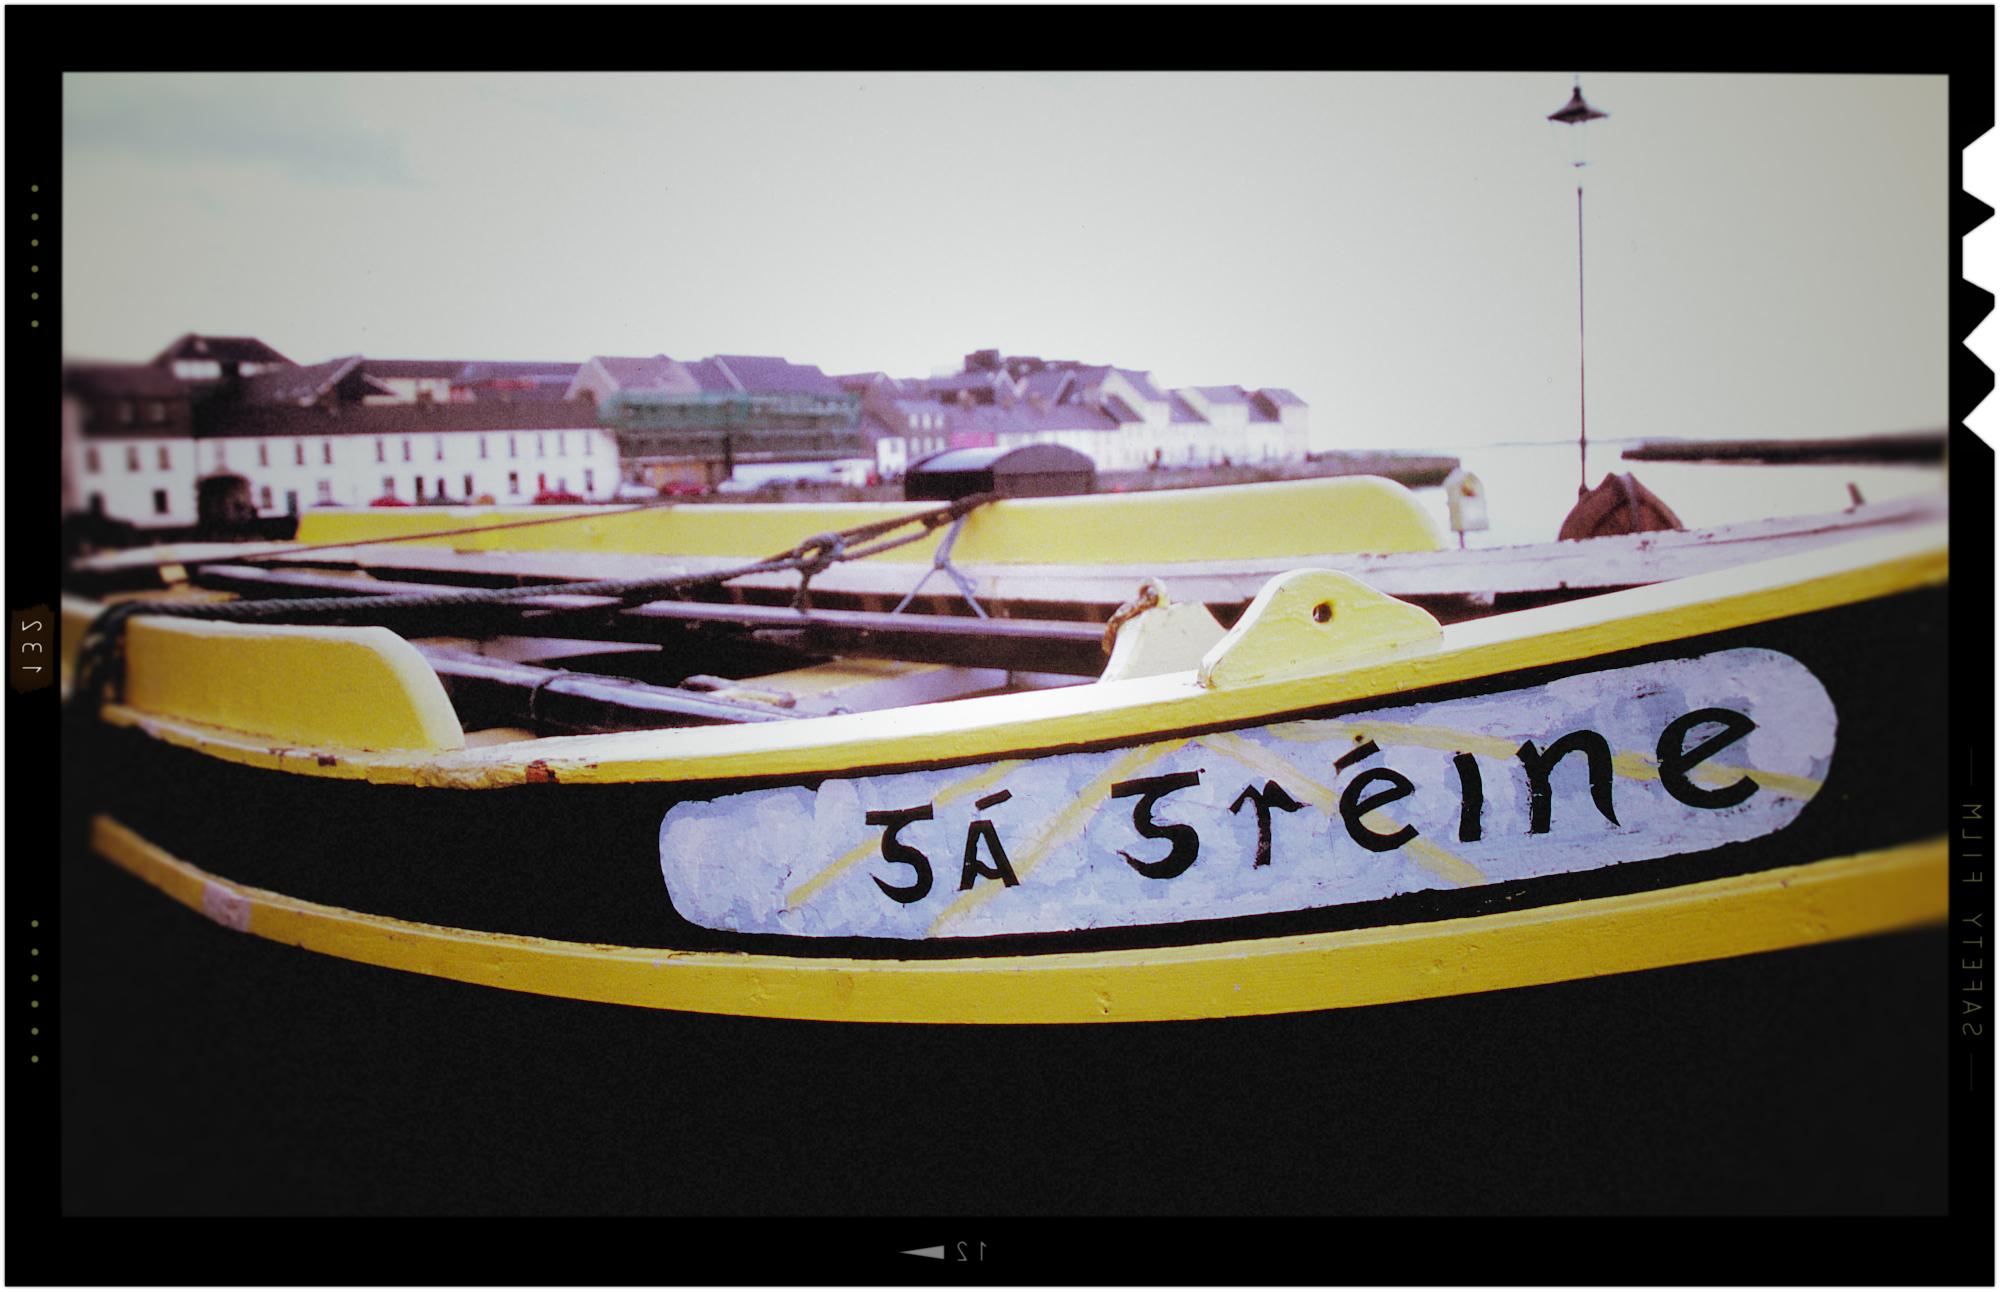 blackyellowboat.jpg